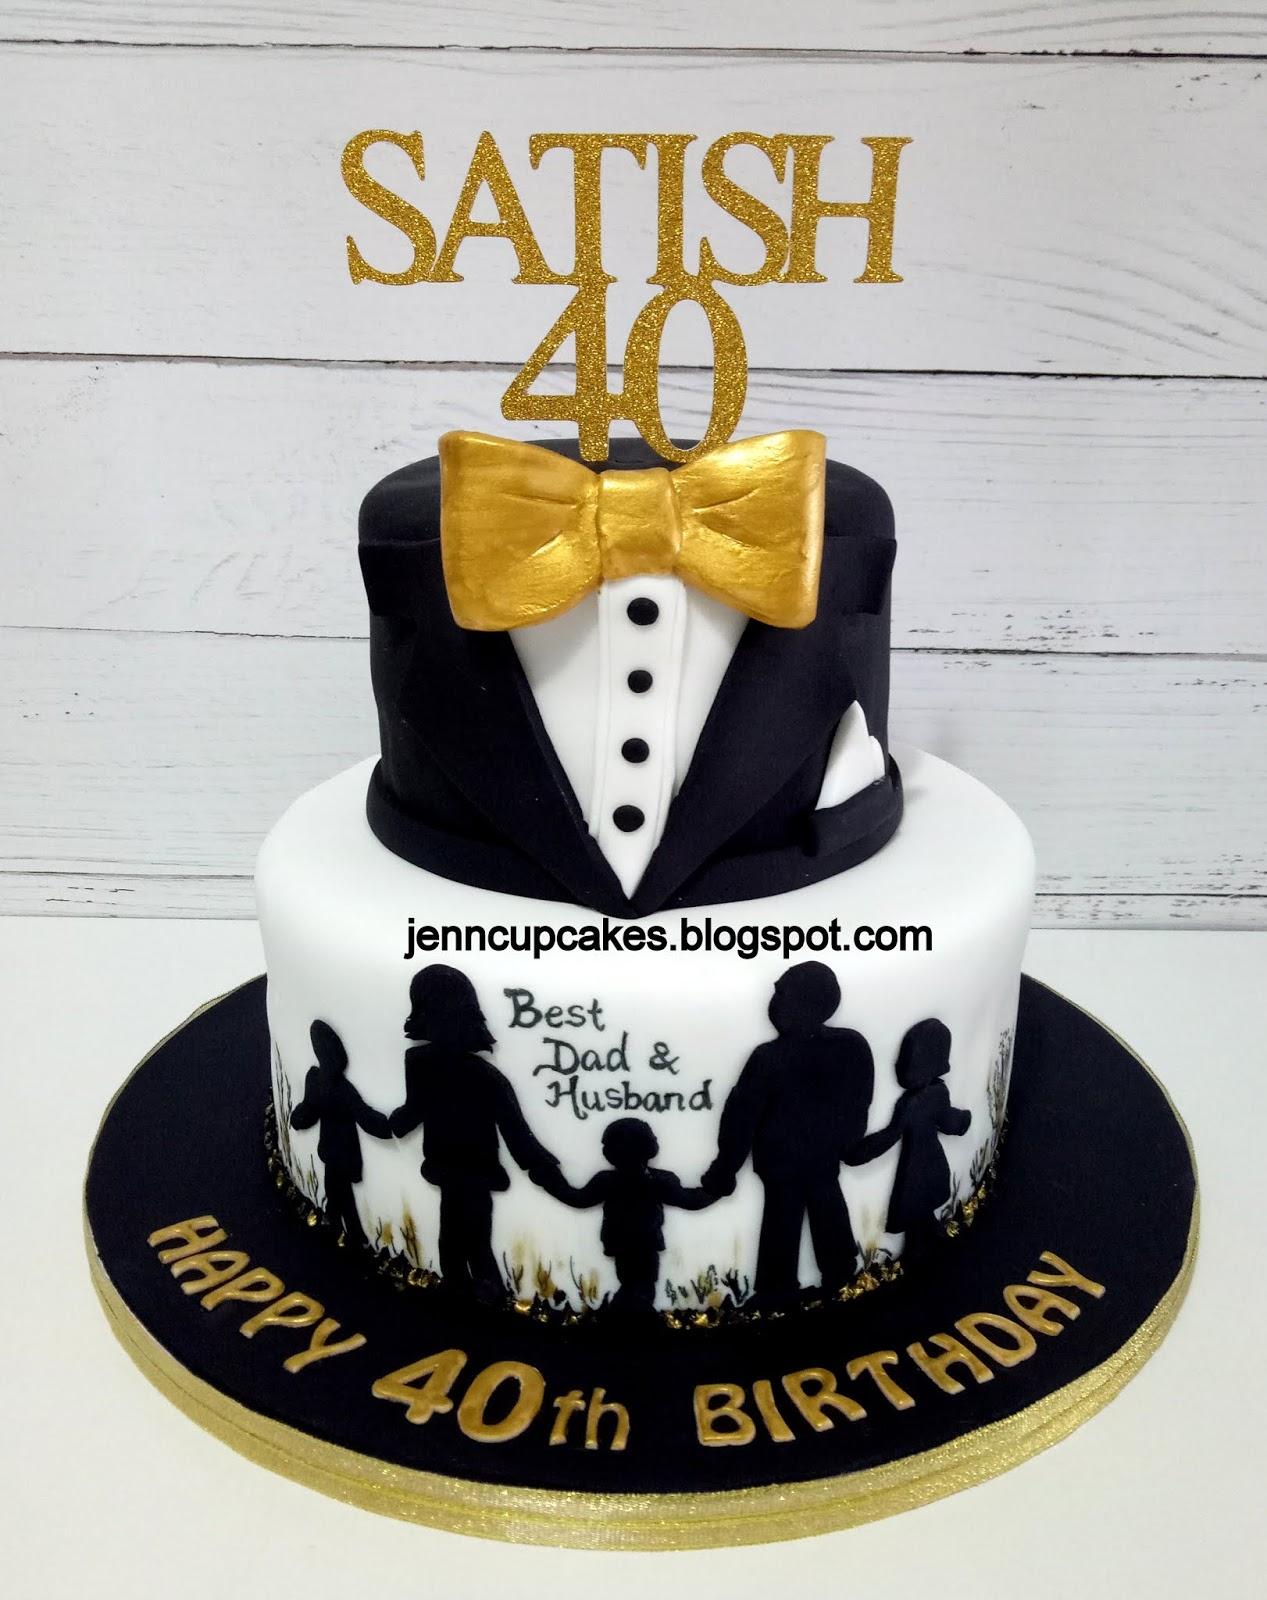 Amazing Jenn Cupcakes Muffins 40Th Birthday Cake Funny Birthday Cards Online Fluifree Goldxyz